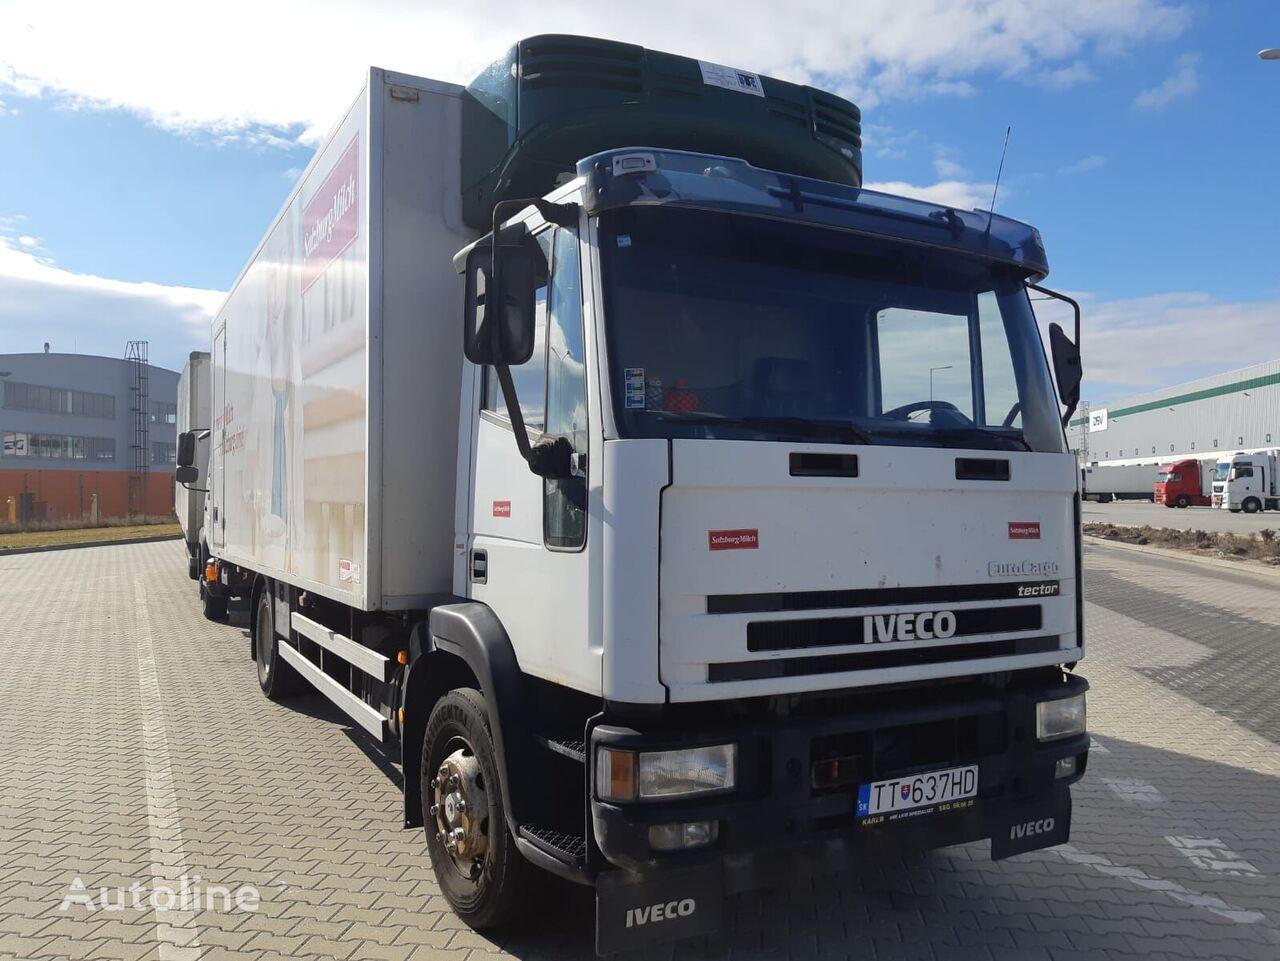 IVECO eurocargo 1224 kamion hladnjača